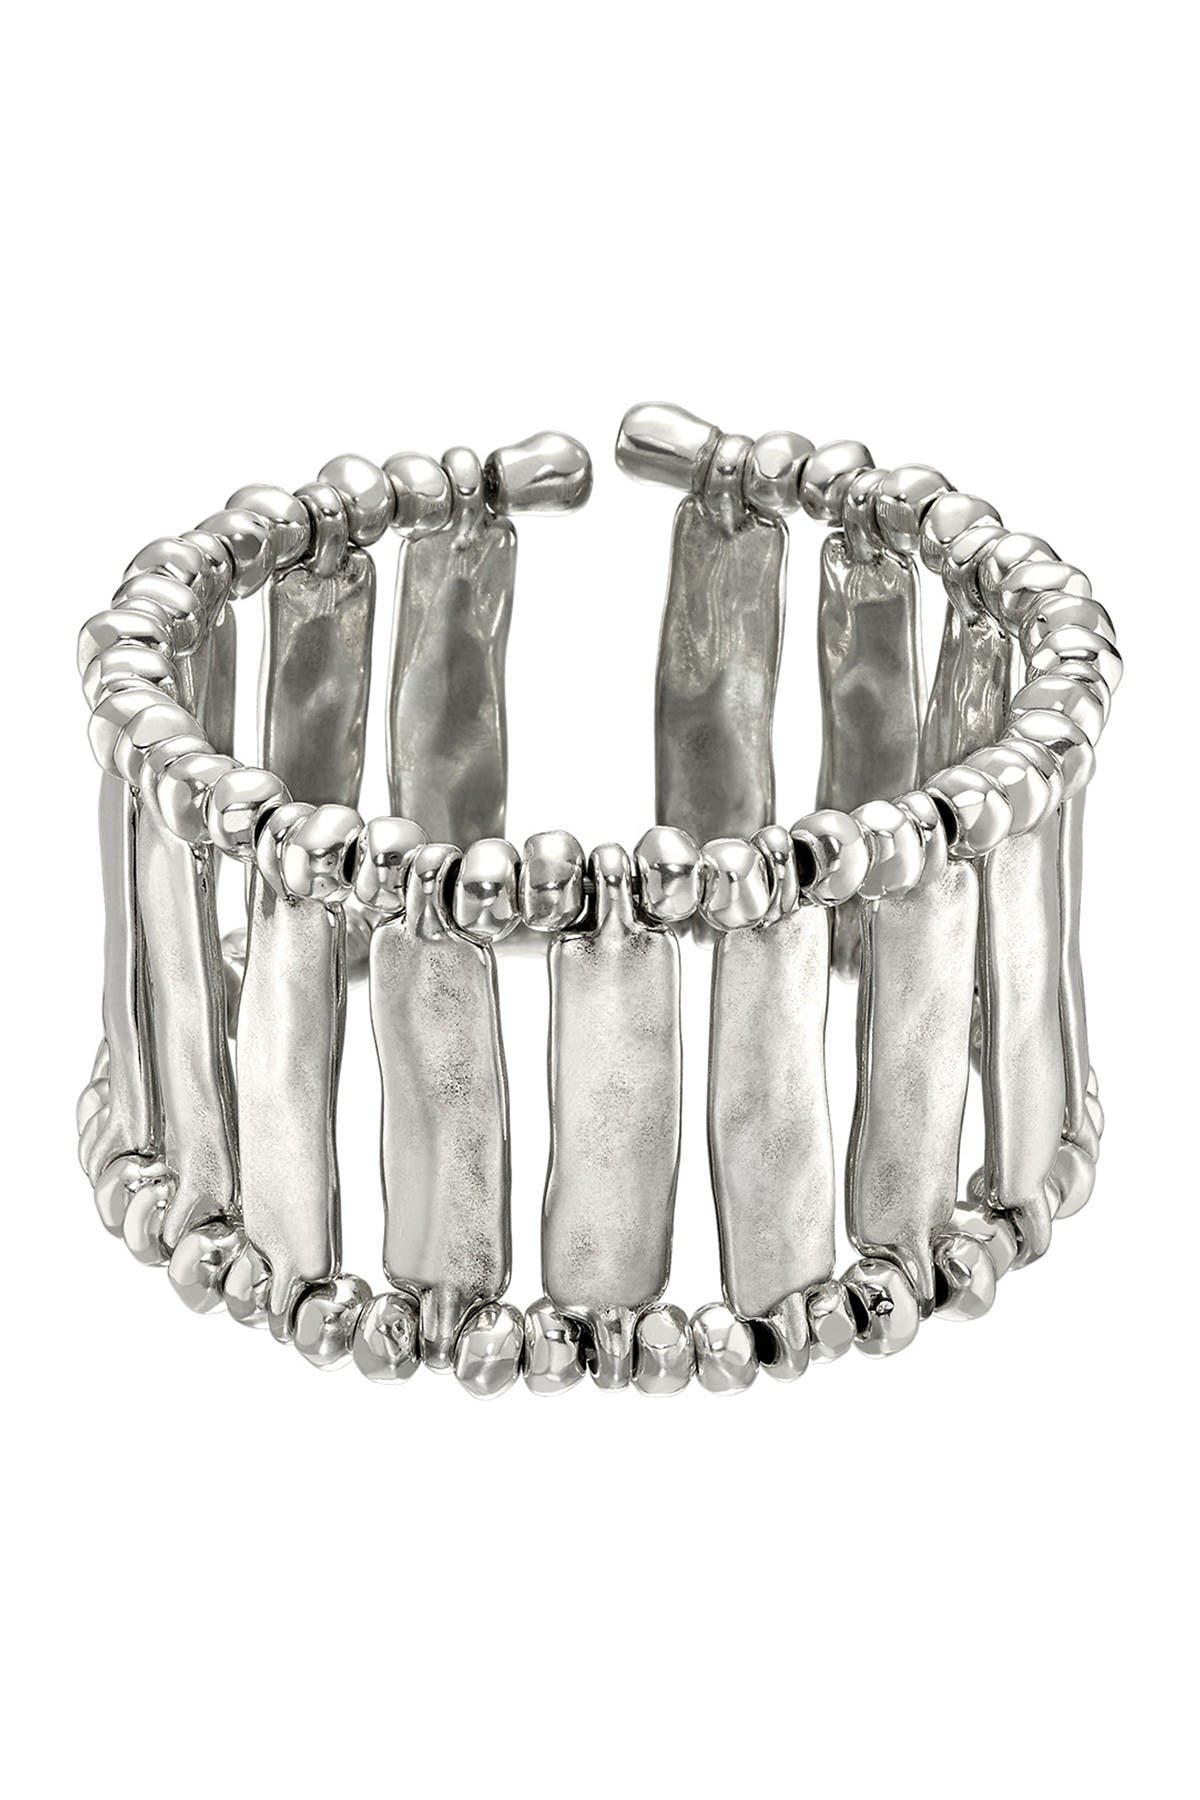 Image of Uno De 50 Lizza Bracelet